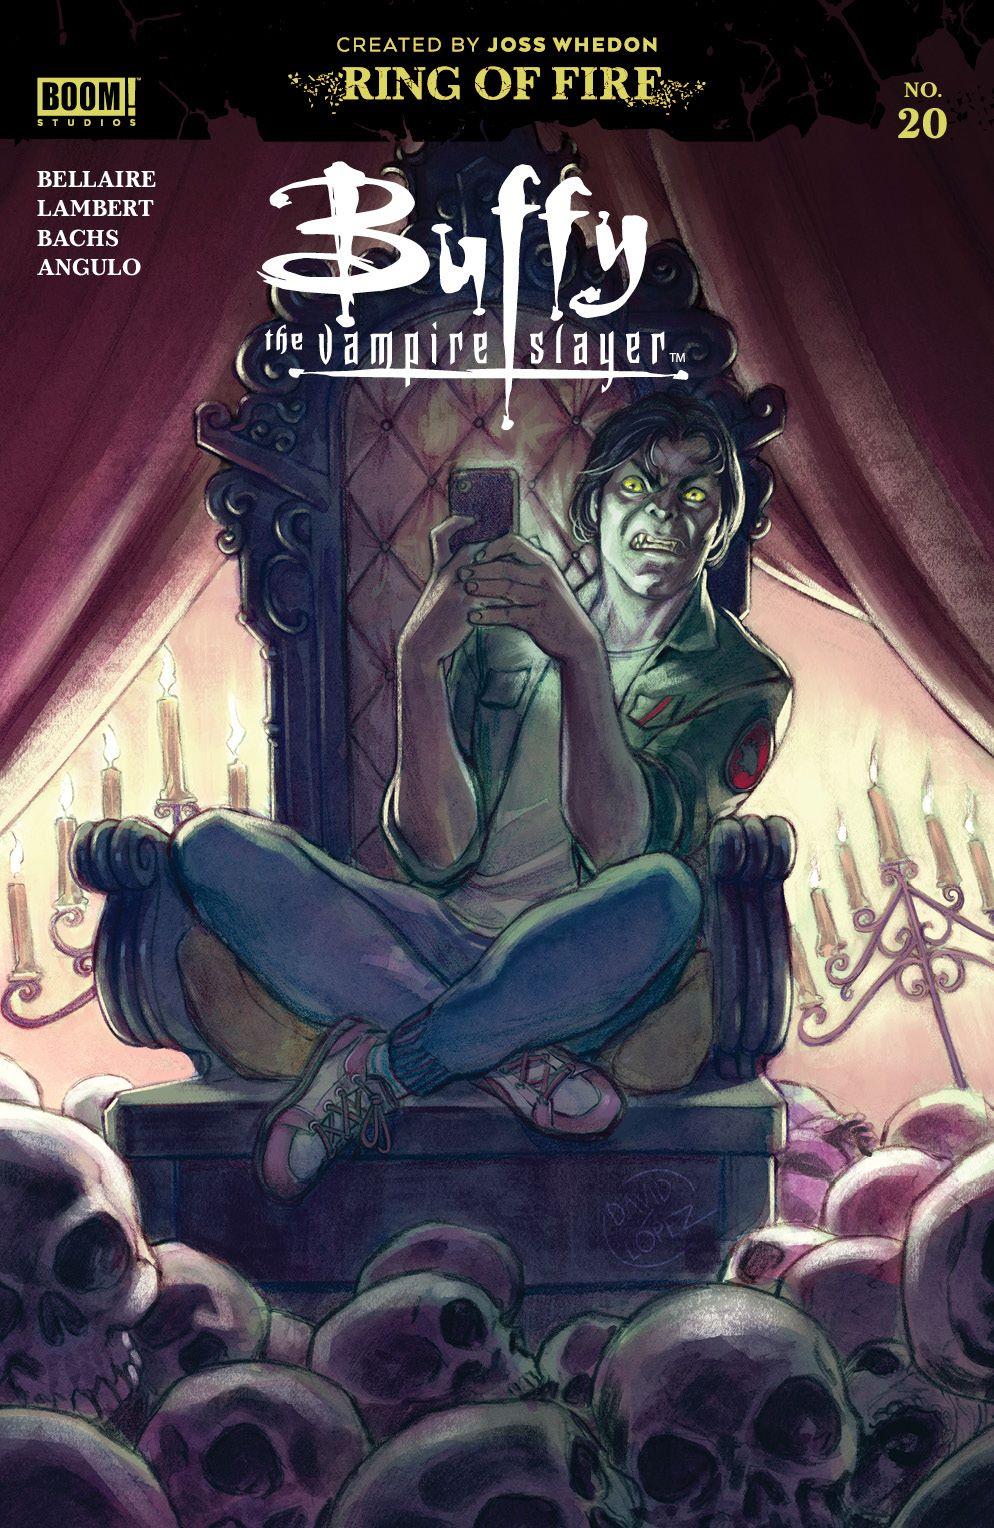 Buffy_020_Cover_A_Main ComicList Previews: BUFFY THE VAMPIRE SLAYER #20